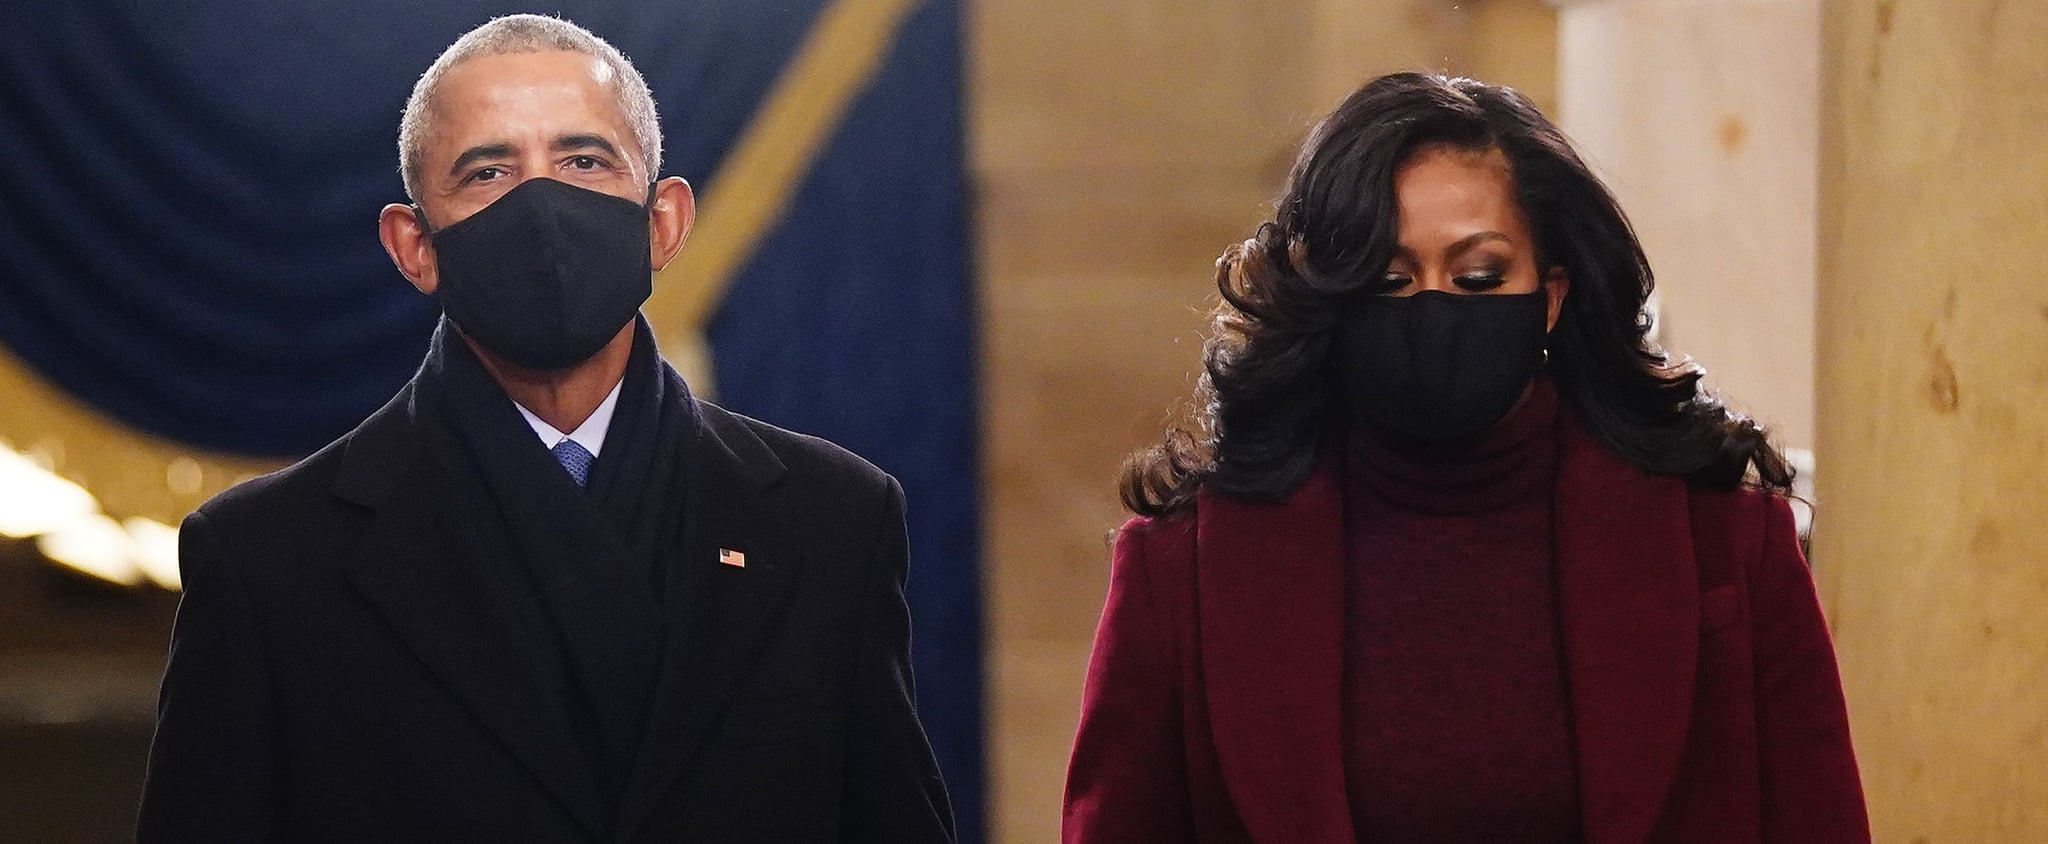 Yene Damtew Talks Michelle Obama's Inauguration Hairstyle